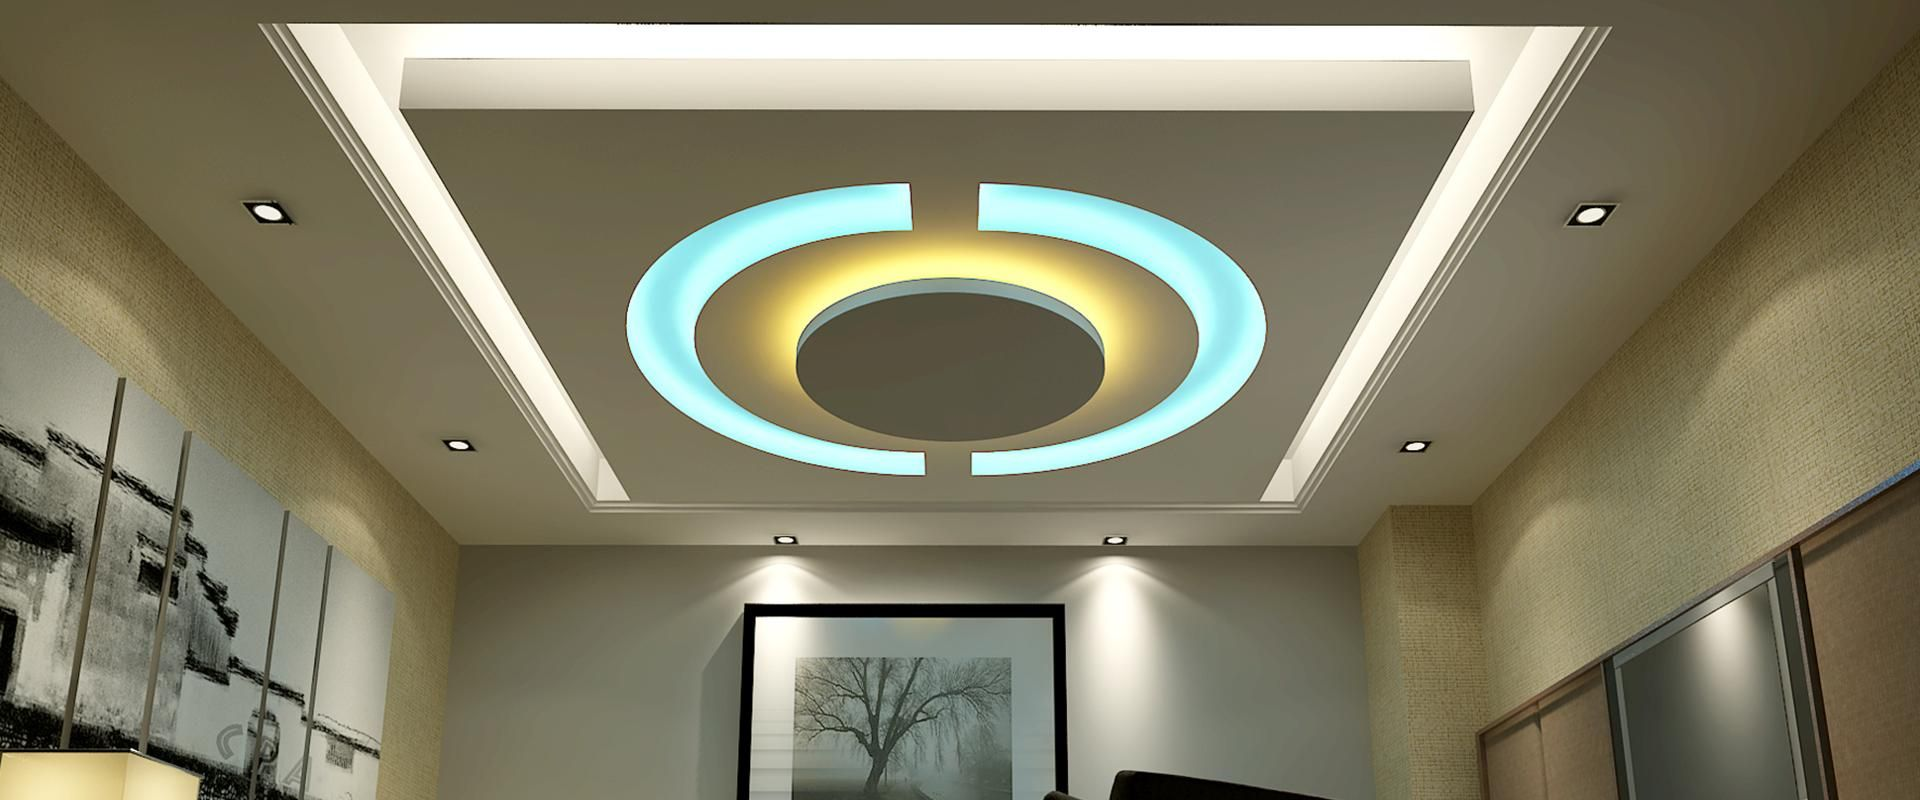 Pin By Blue Interior Designs On Home Interior Chennai Gypsum Ceiling Design False Ceiling